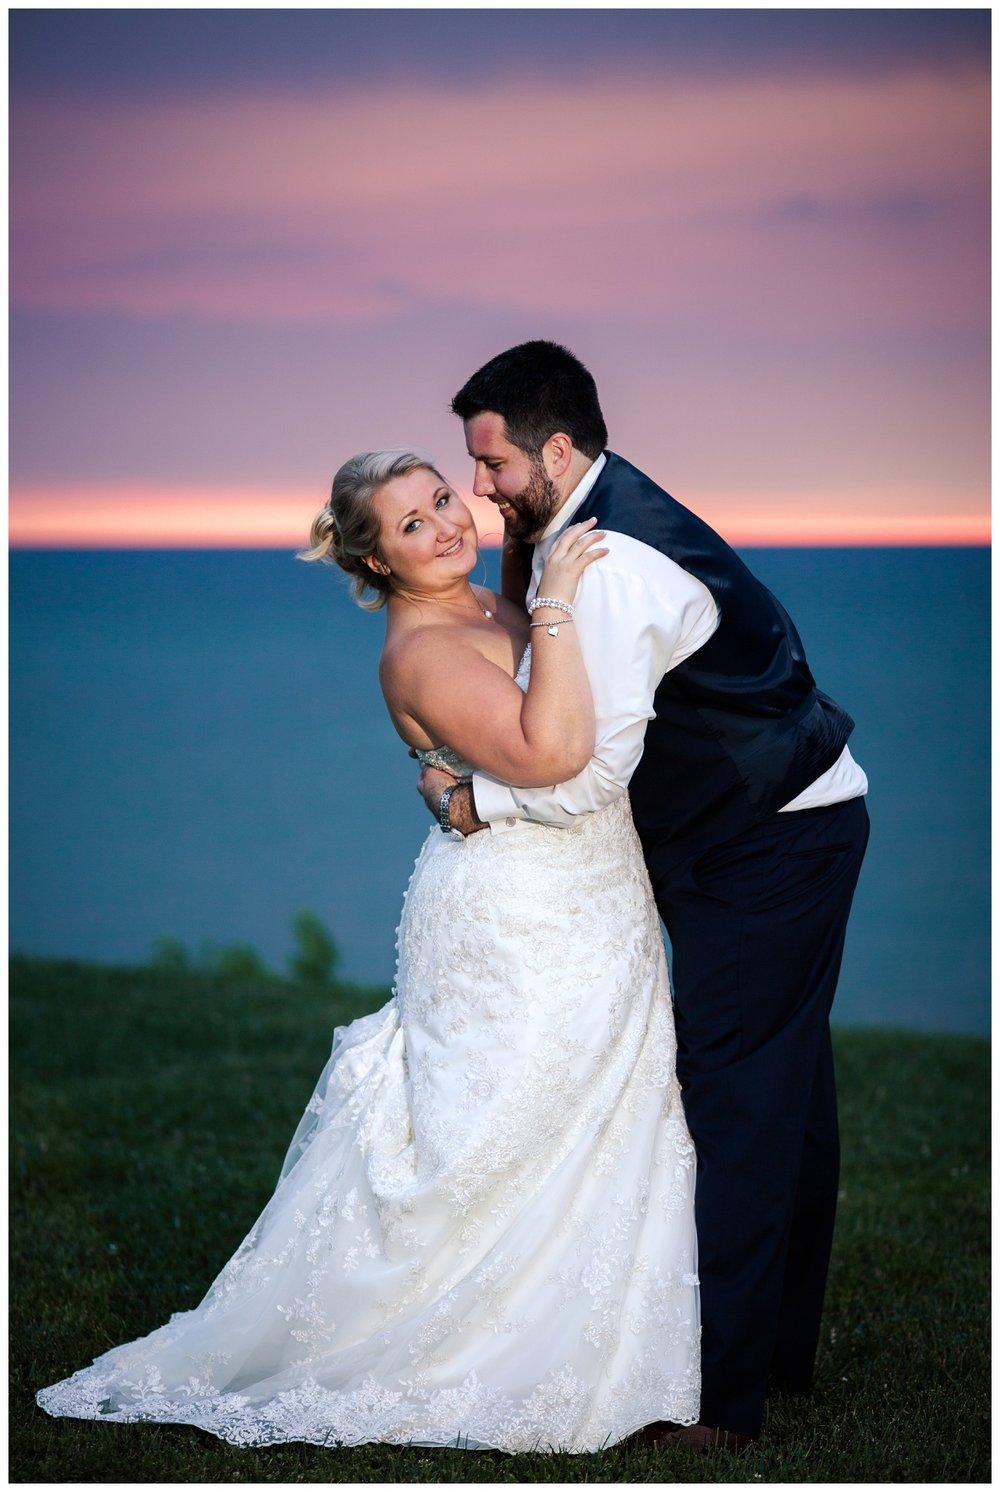 Mr. and Mrs. Kramp_0070.jpg